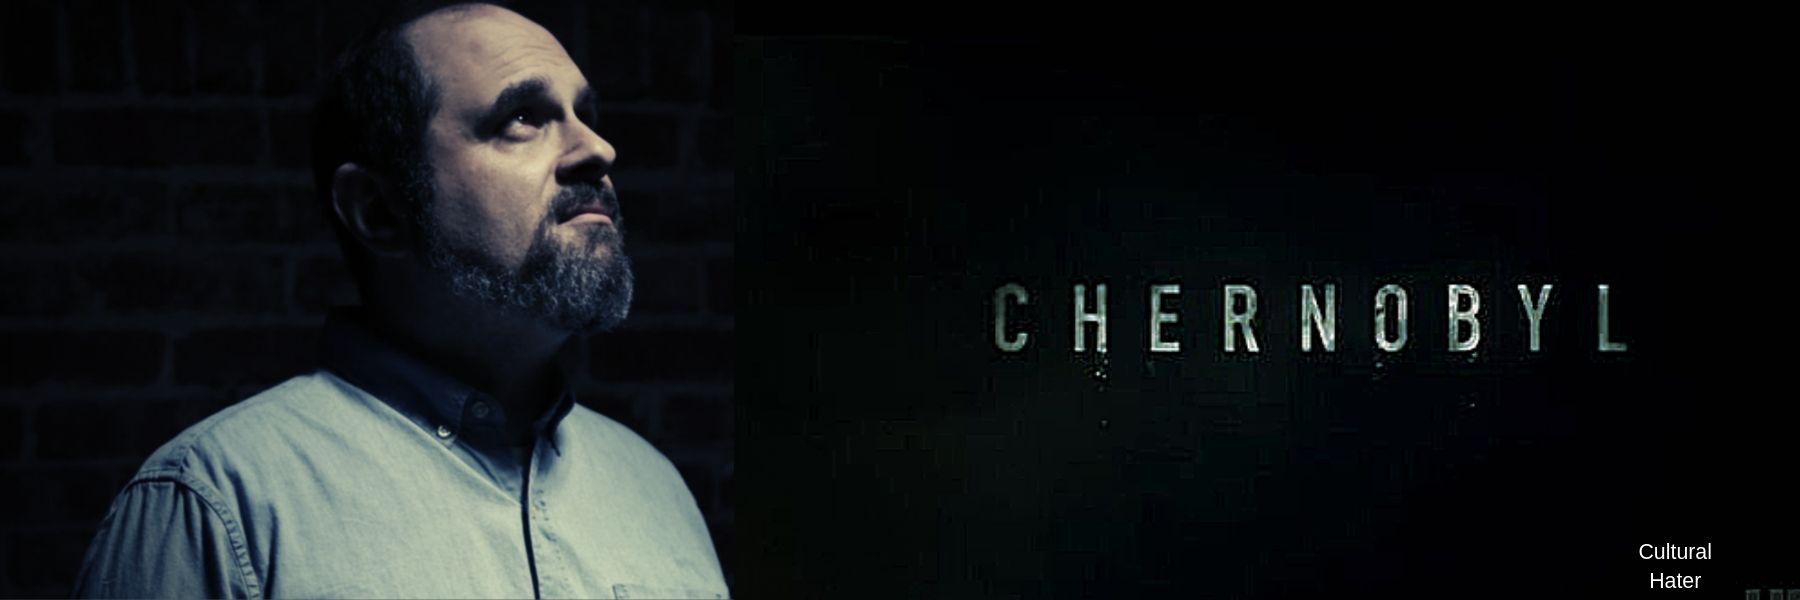 Craig Mazin the creator of Chernobyl